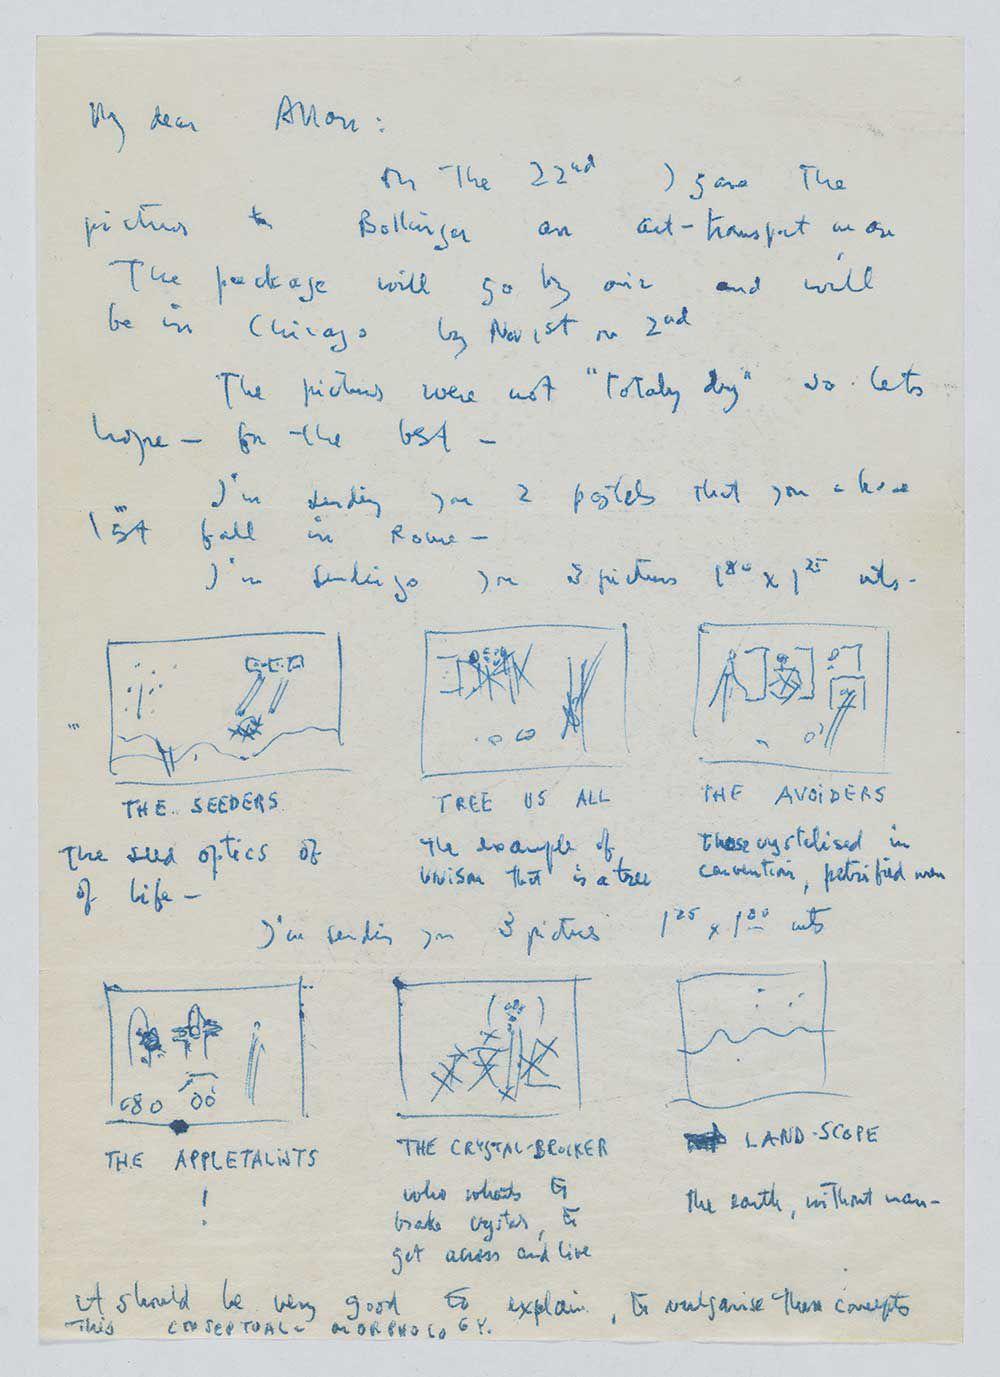 Letter sent to Allan Frumkin from Roberto Matta